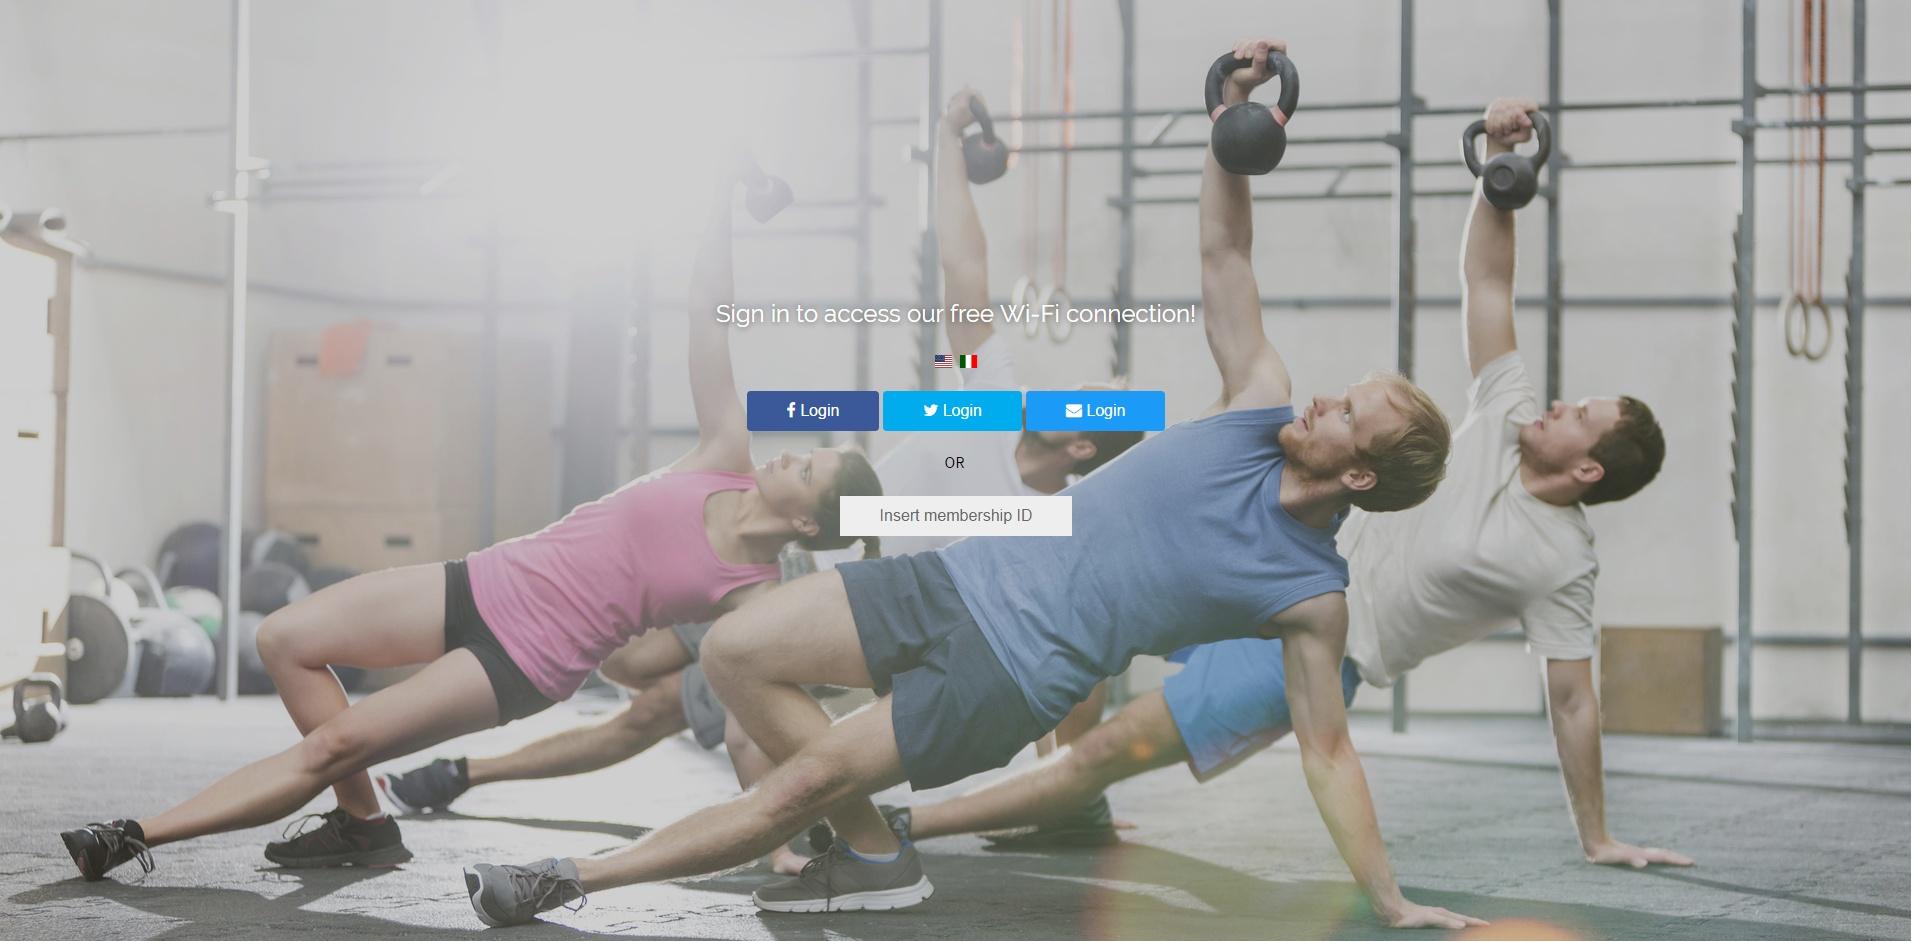 Gym splash page